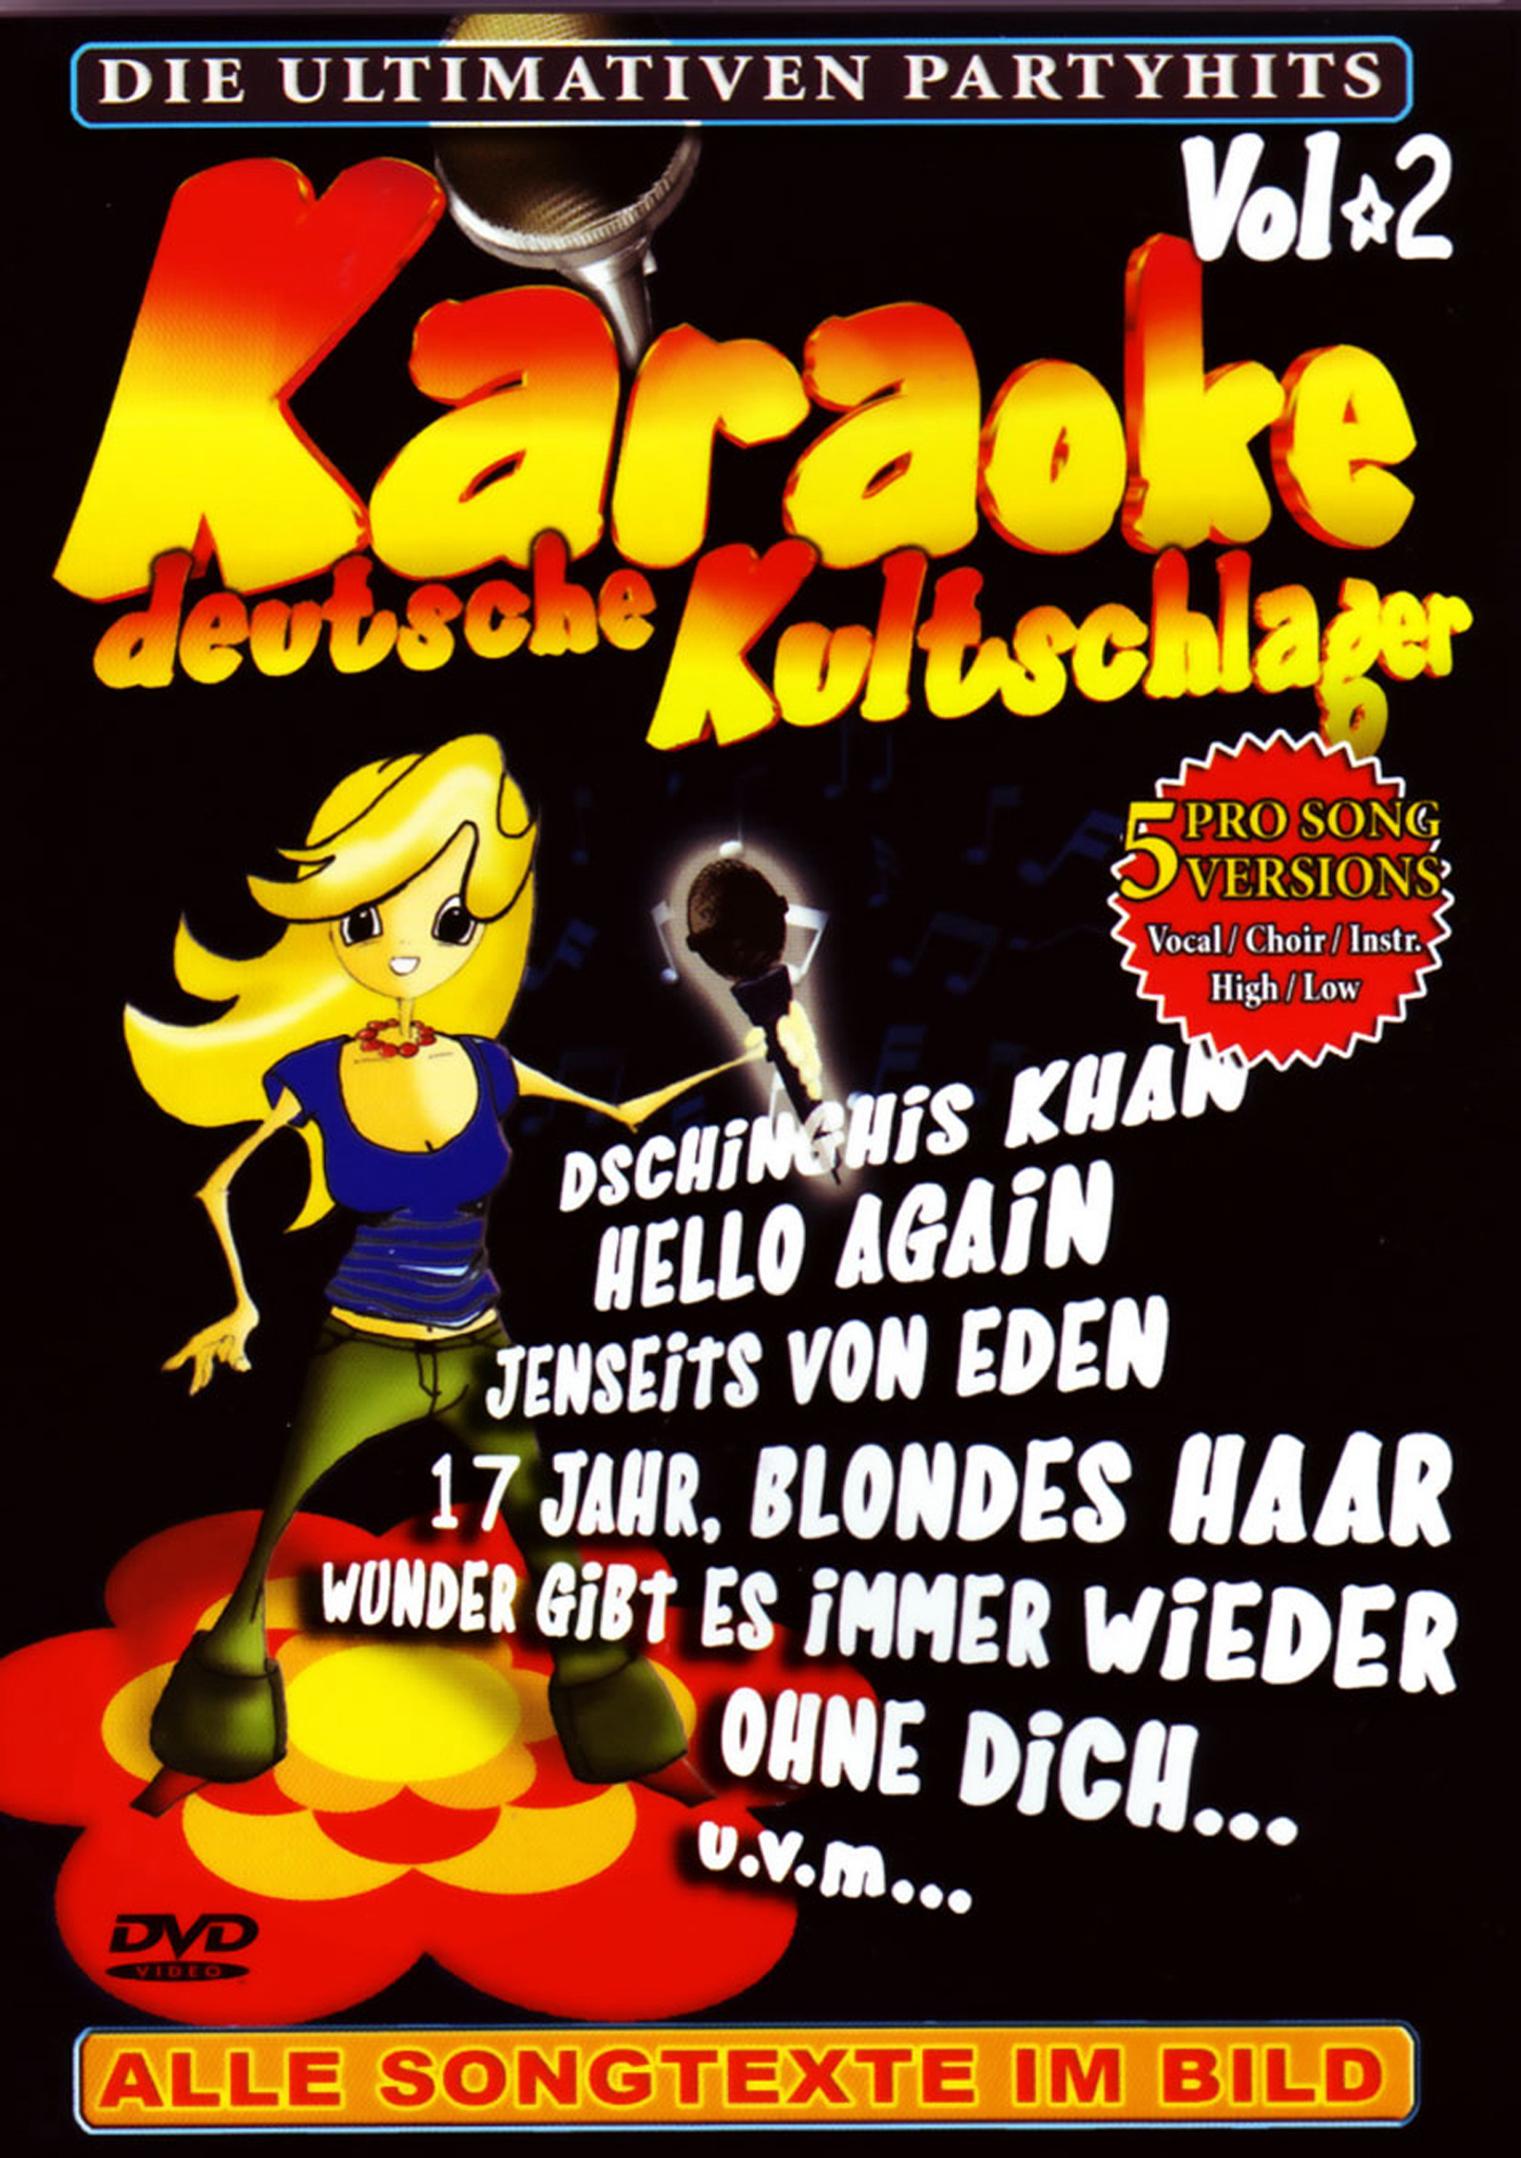 Karaoke: Deutsche Kultschlager - Vol. 2